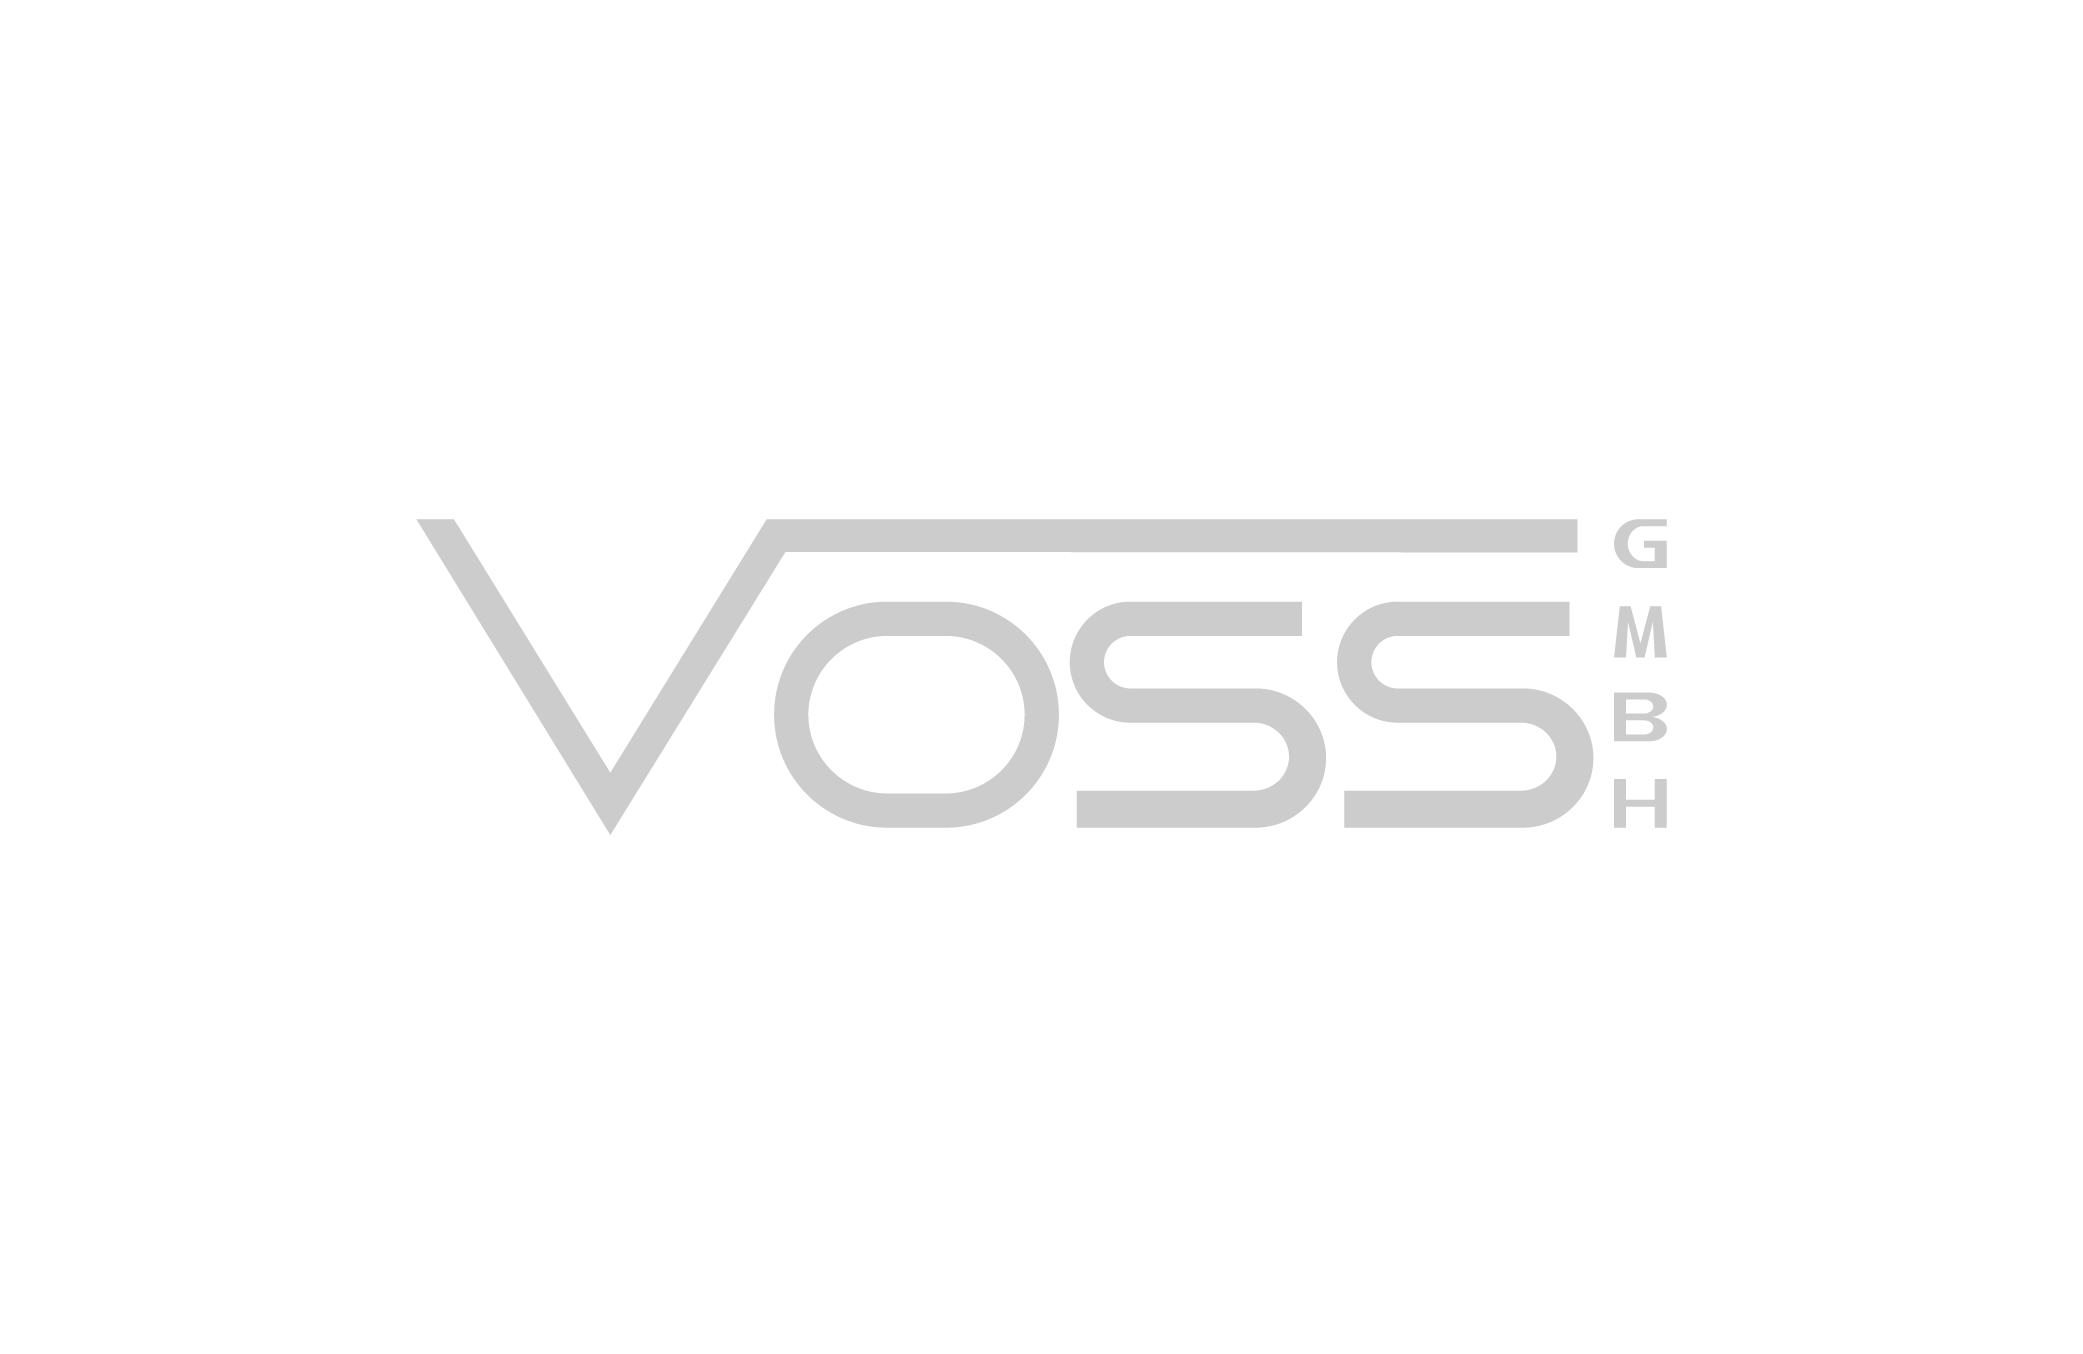 VOSS GmbH